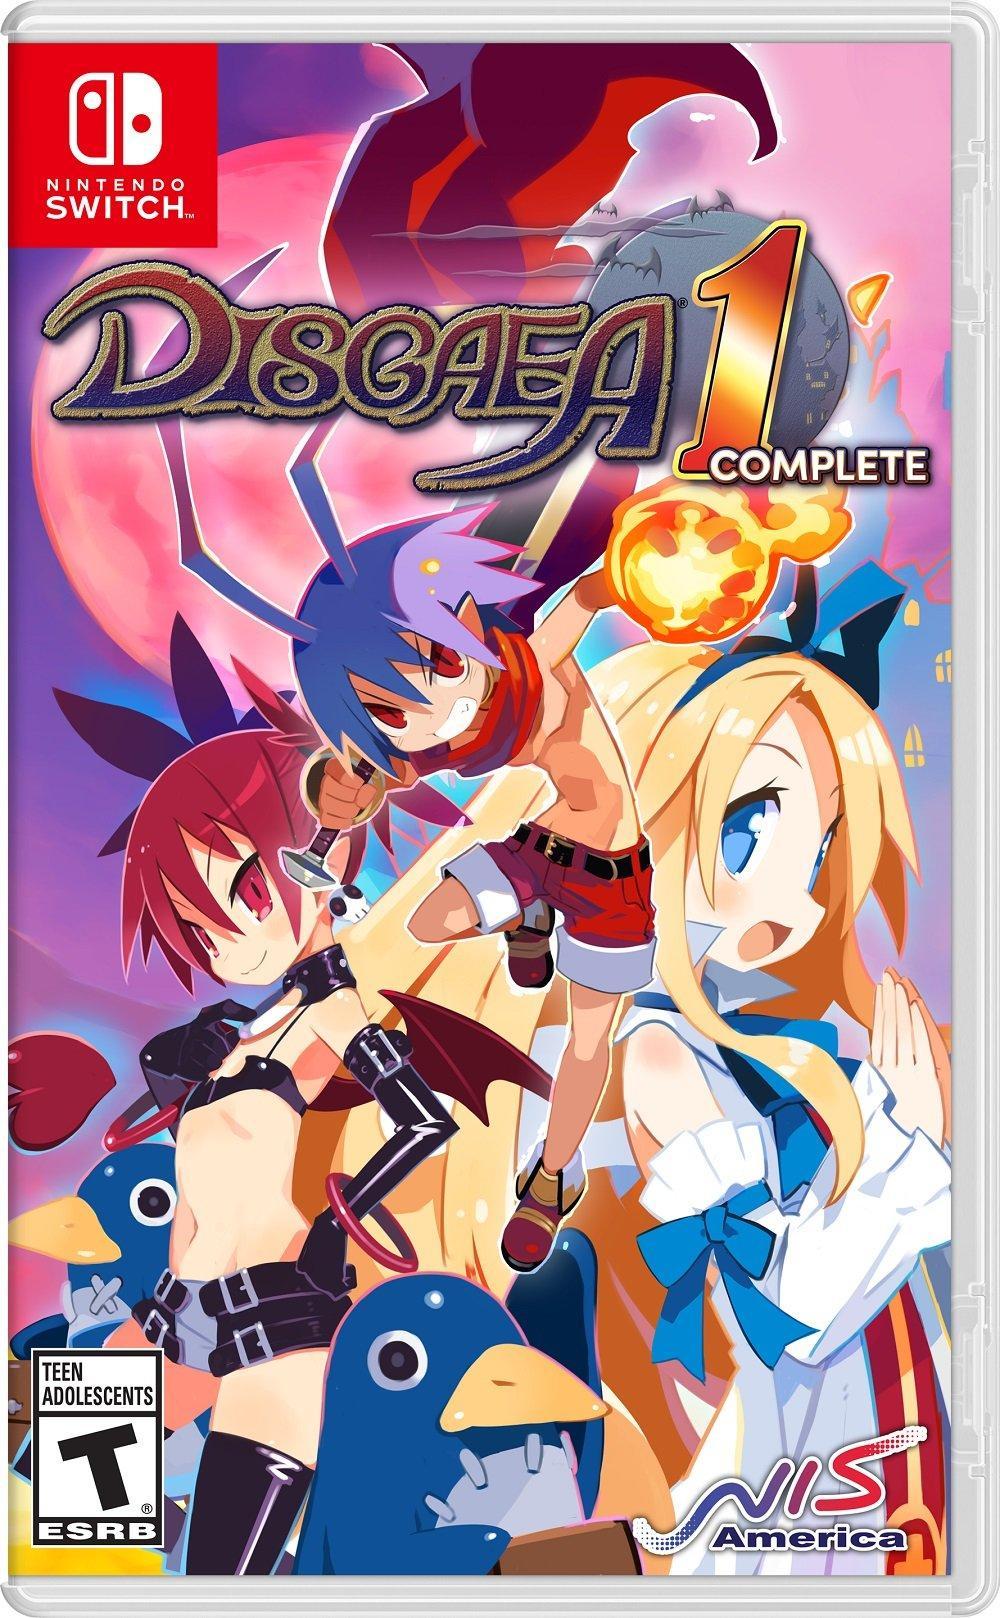 Disgaea 1 Complete [Nintendo Switch] @ Amazon.it